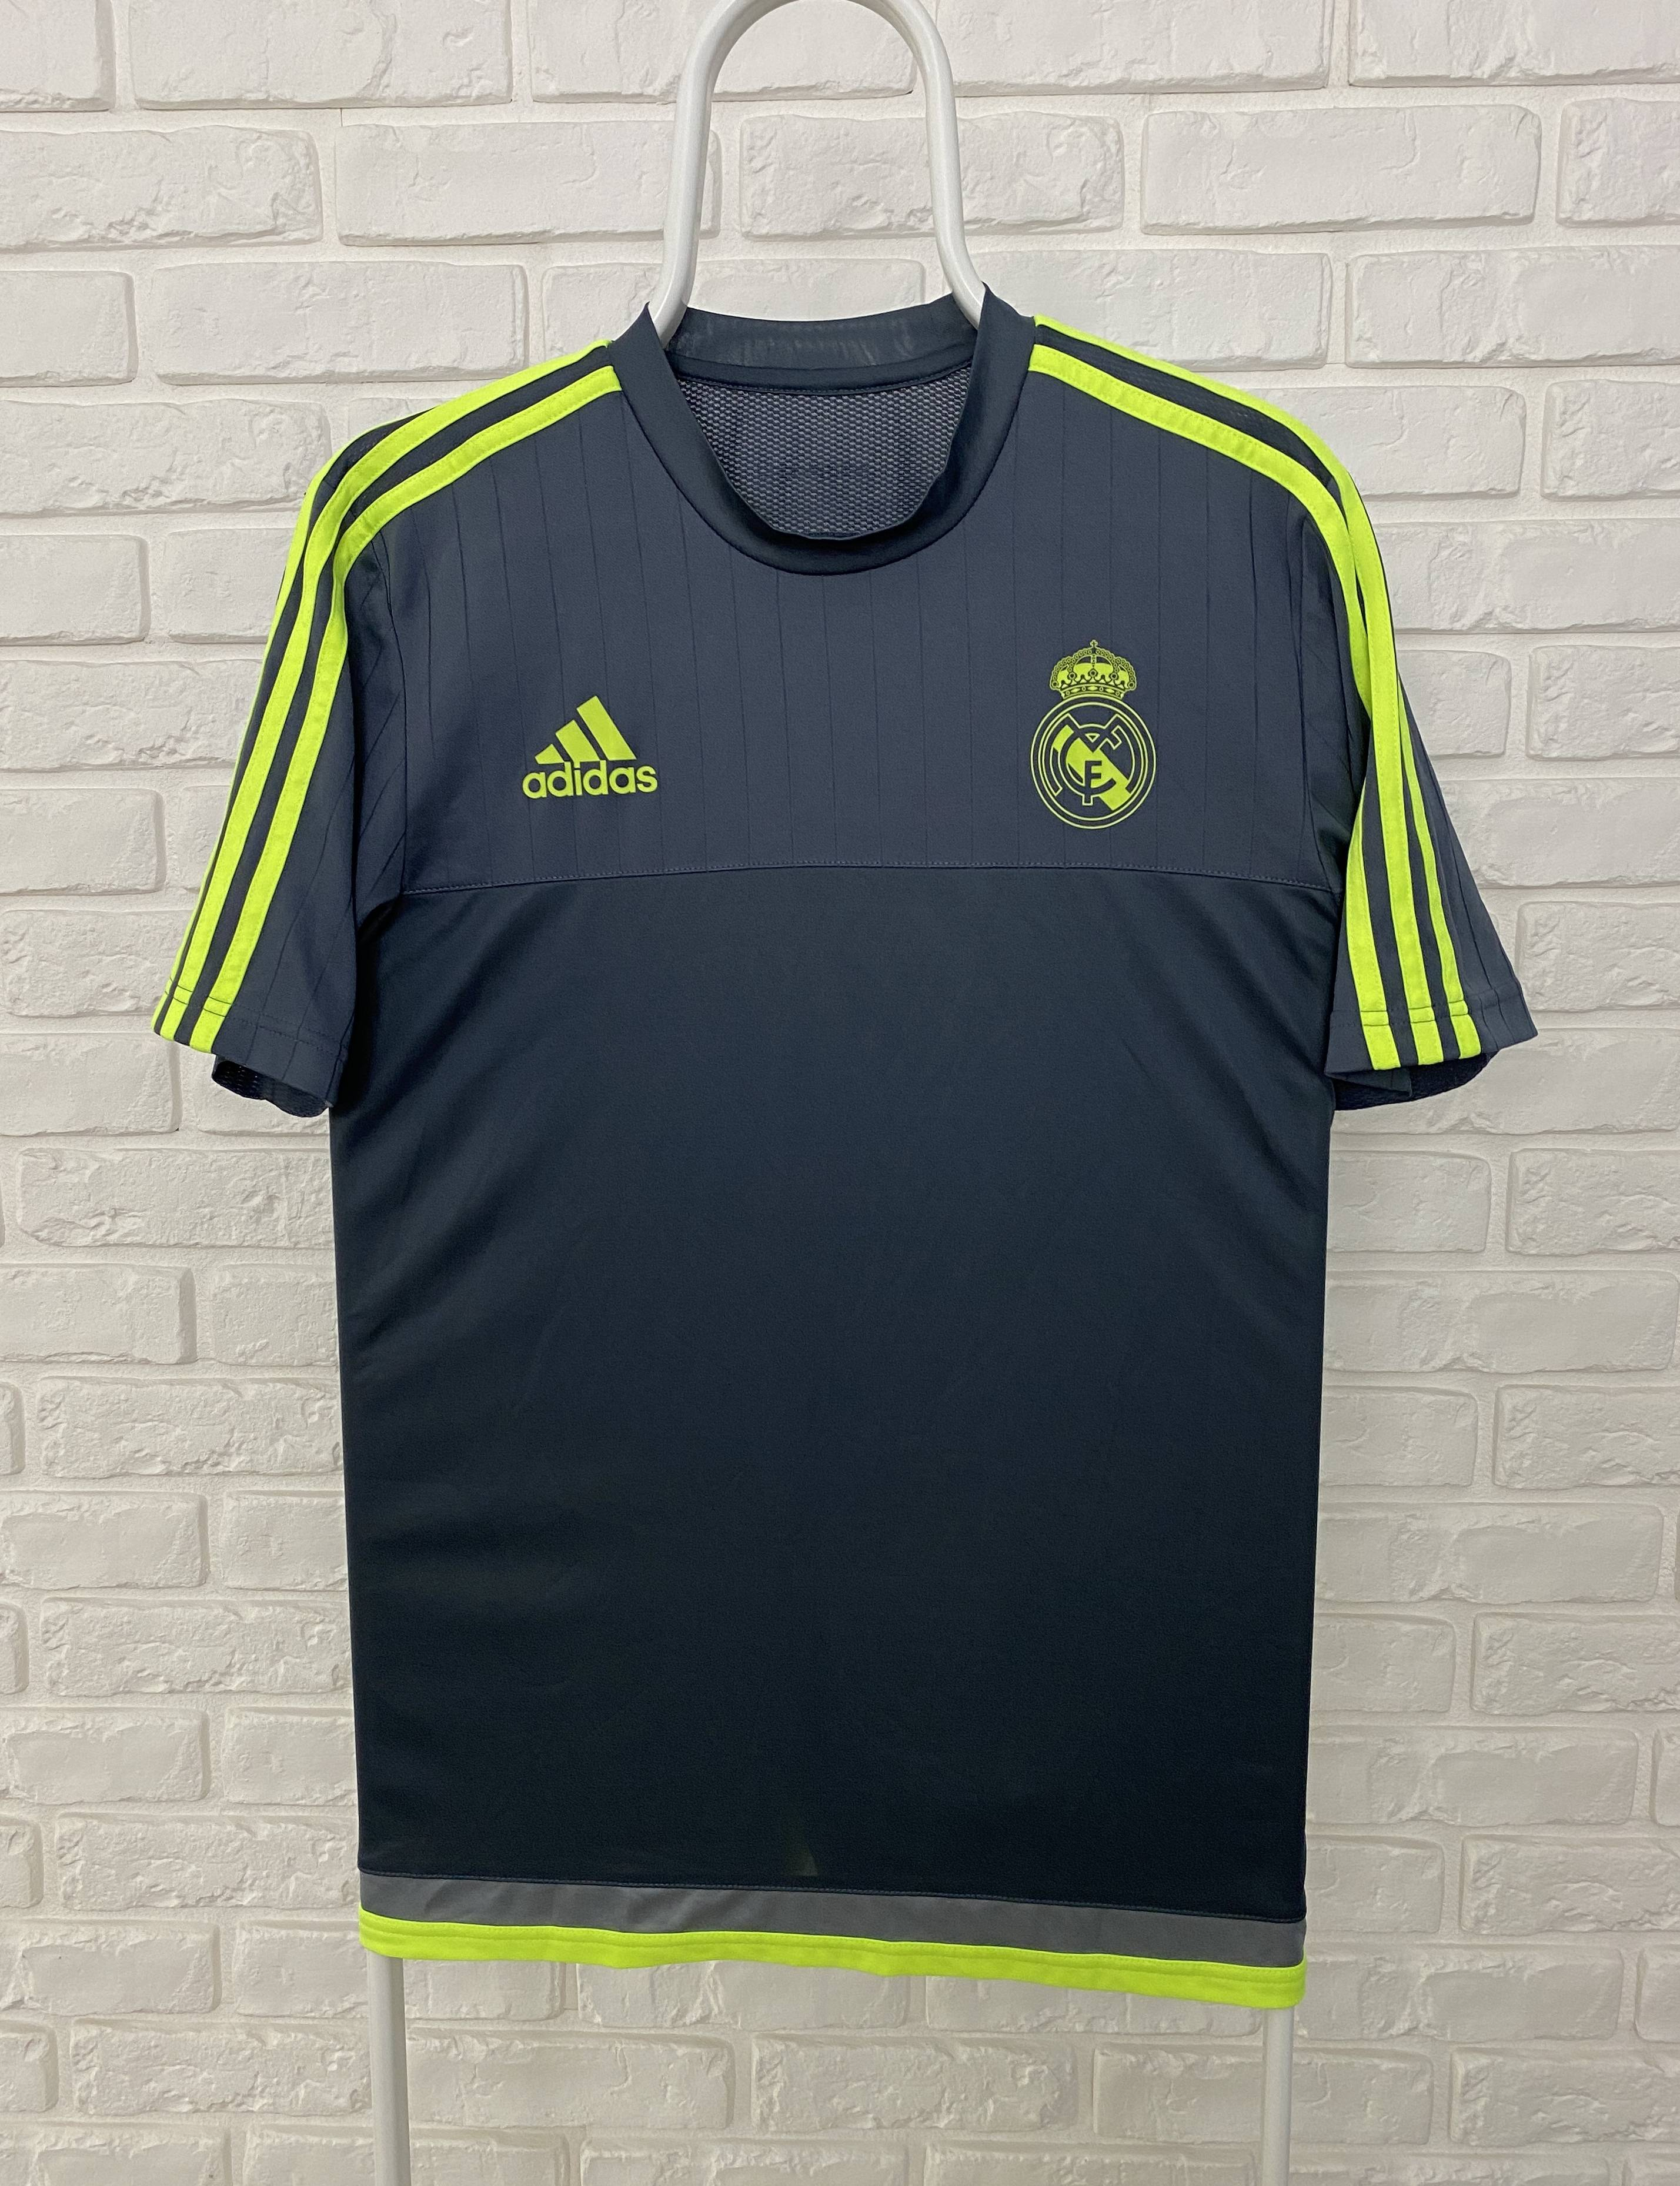 Adidas Real Madrid 2015 2016 Adidas Training Shirt Jersey Size M